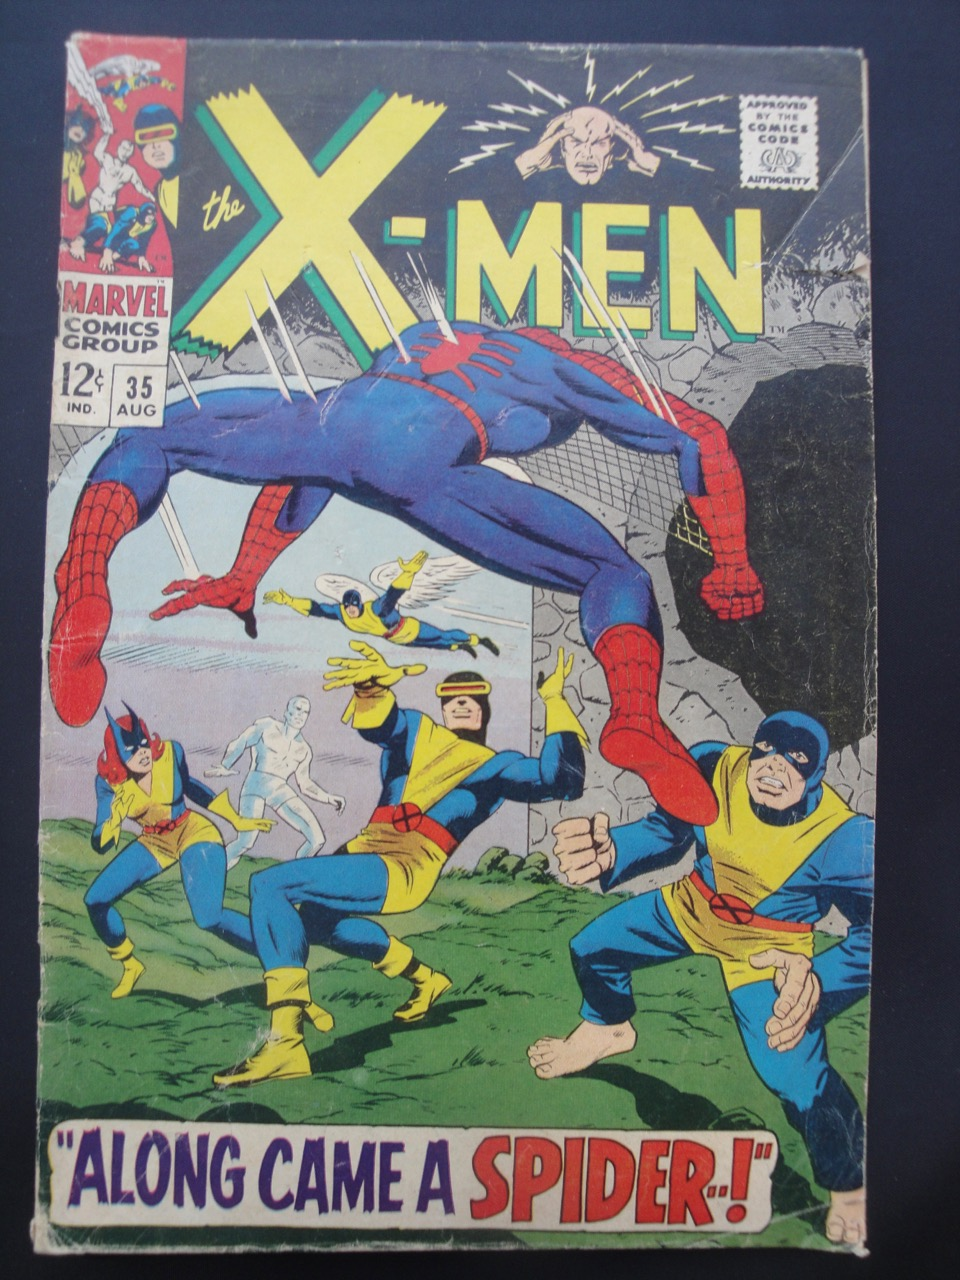 X-Men #35 - 1967 - Silver Age - Spider-Man Crossover, Stan Lee